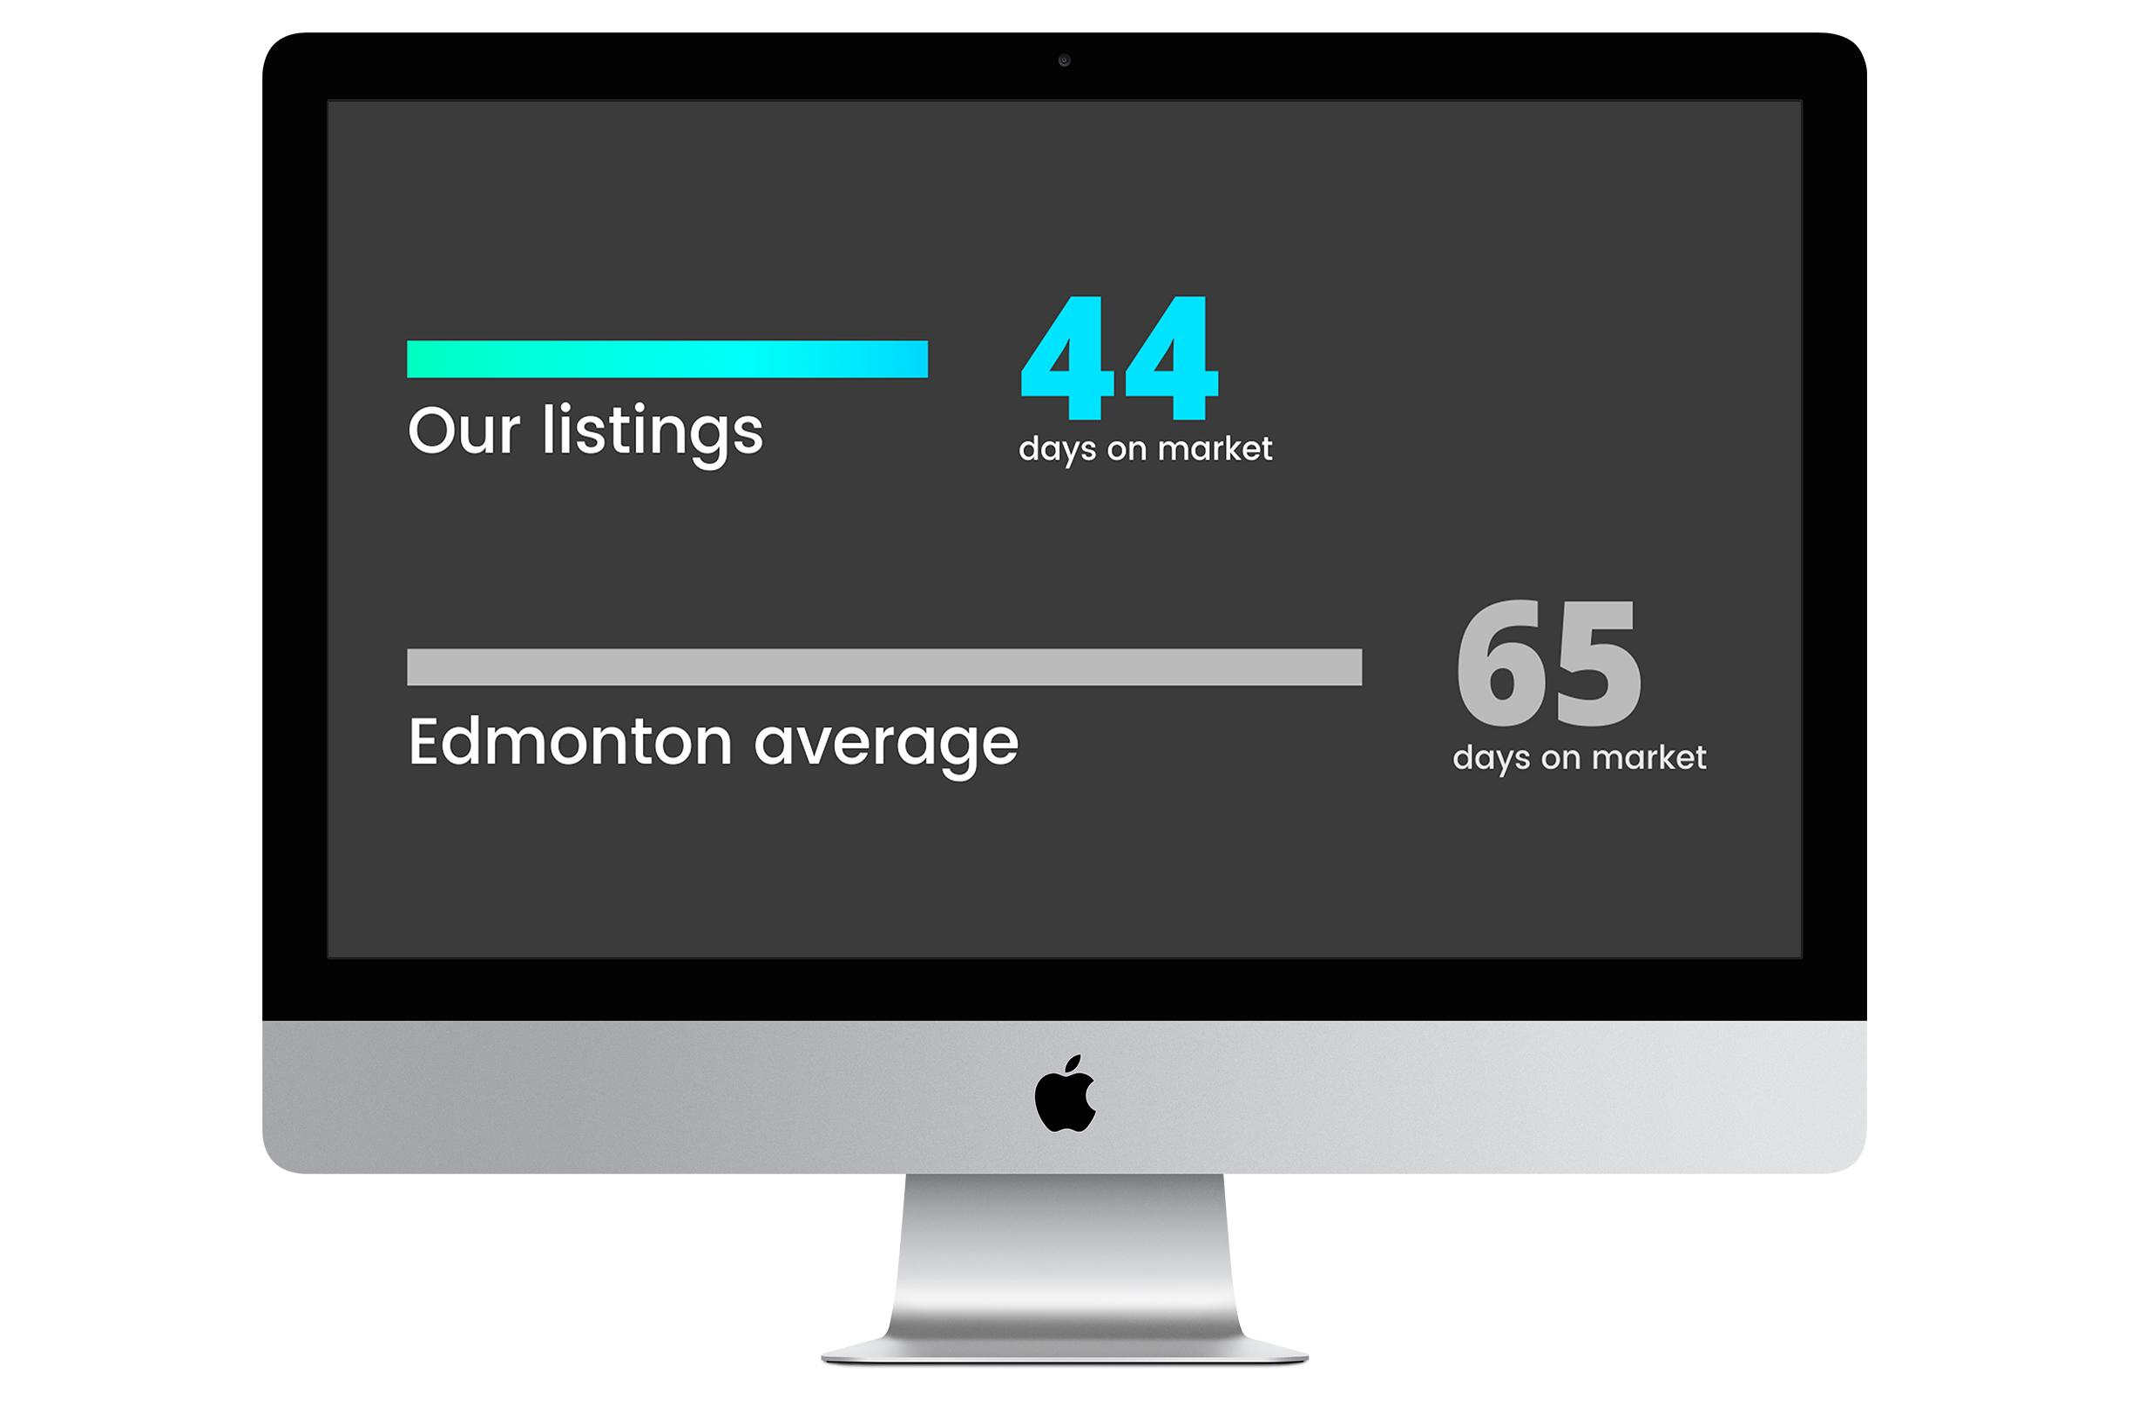 Sale results of Espo's listings versus Edmonton average listings displayed on iMac